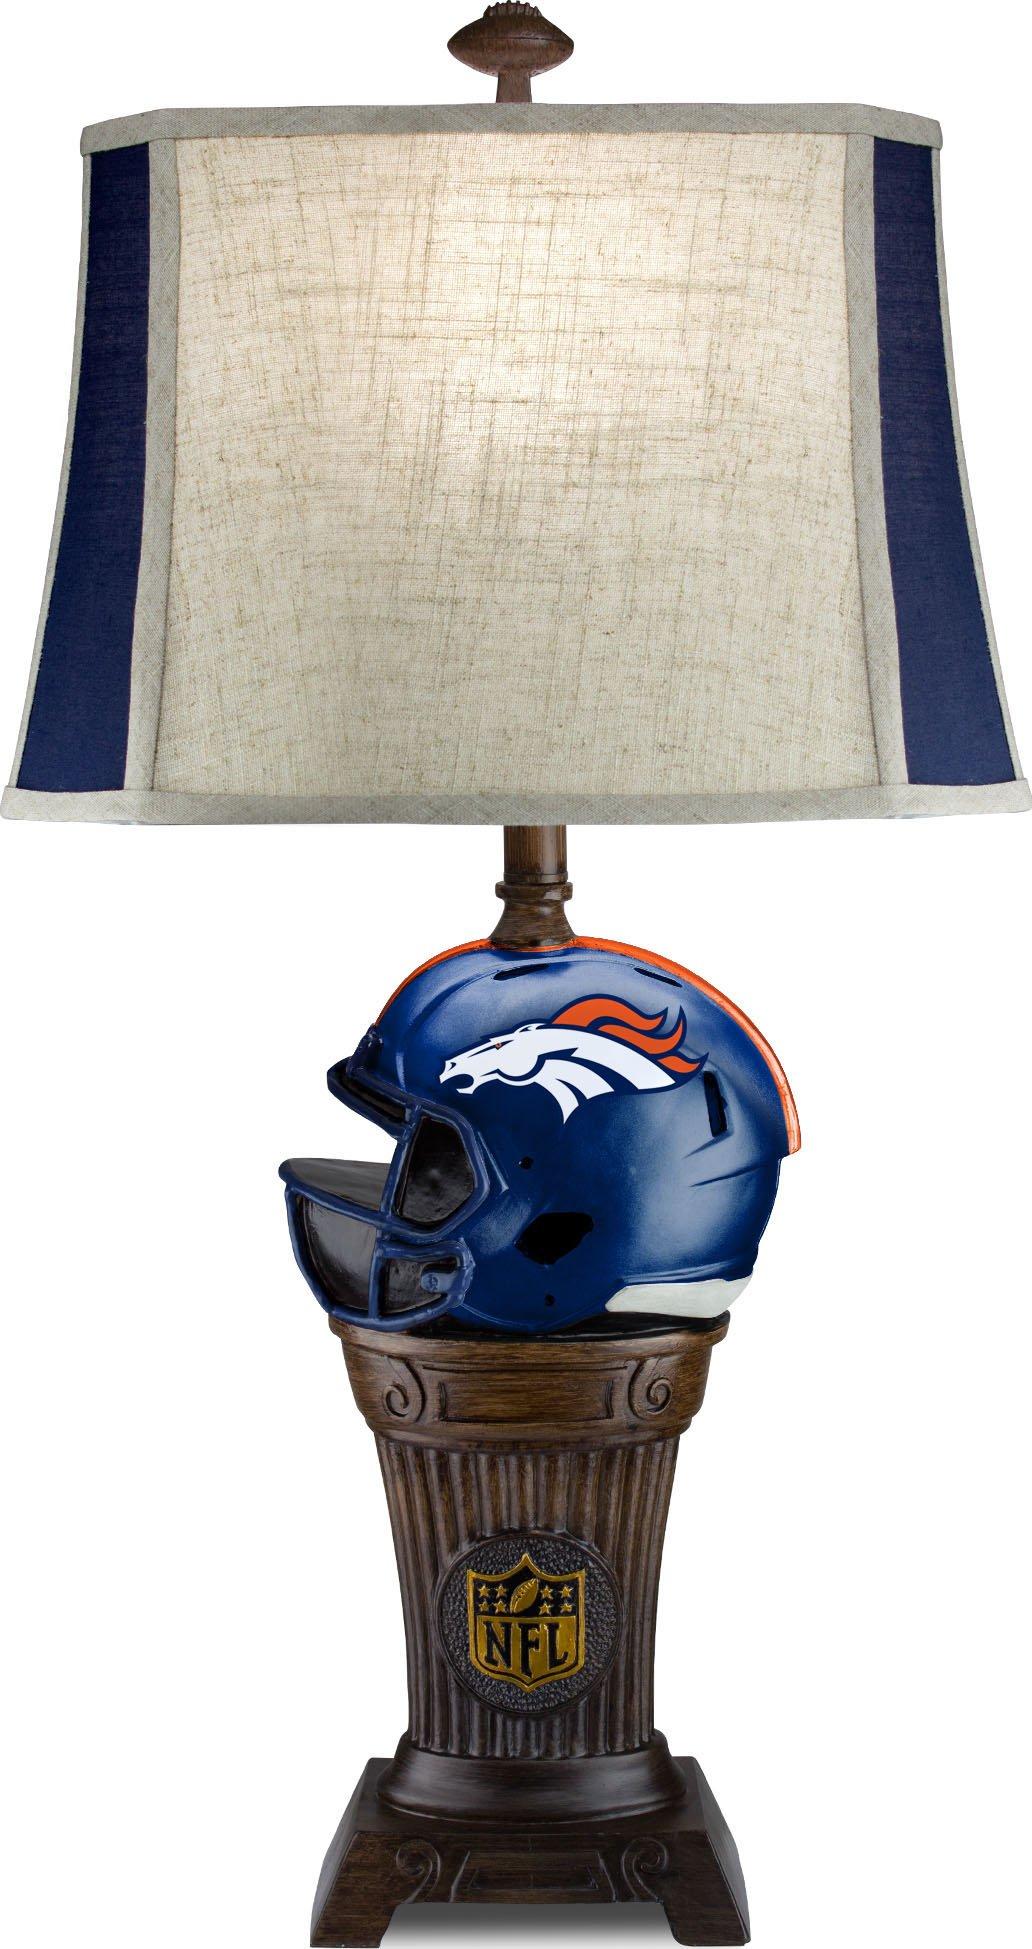 Imperial Officially Licensed NFL Merchandise: Trophy Lamp, Denver Broncos